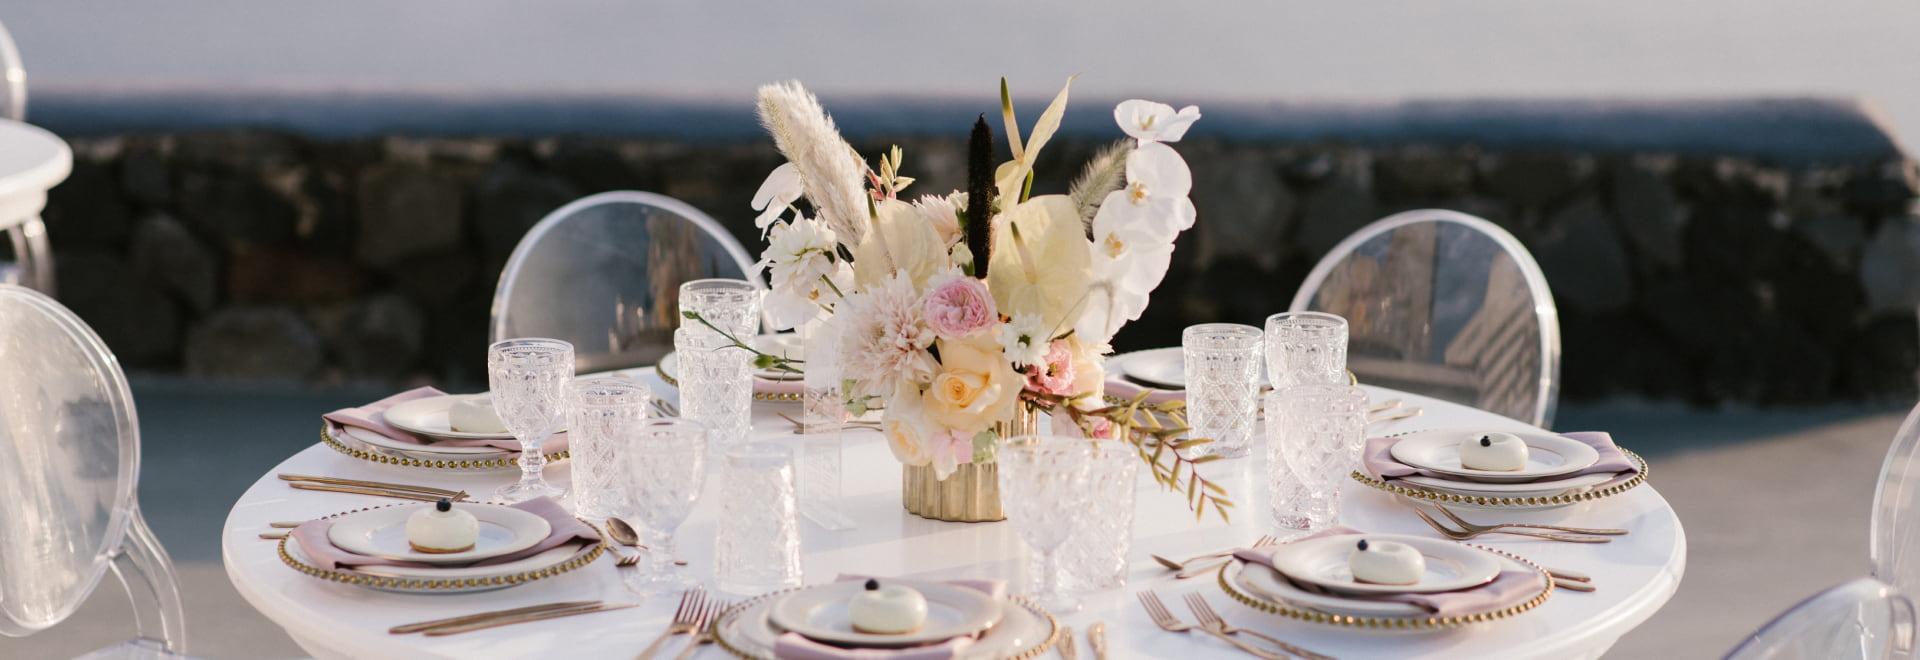 Wedding Wish - Wedding Services in Santorini